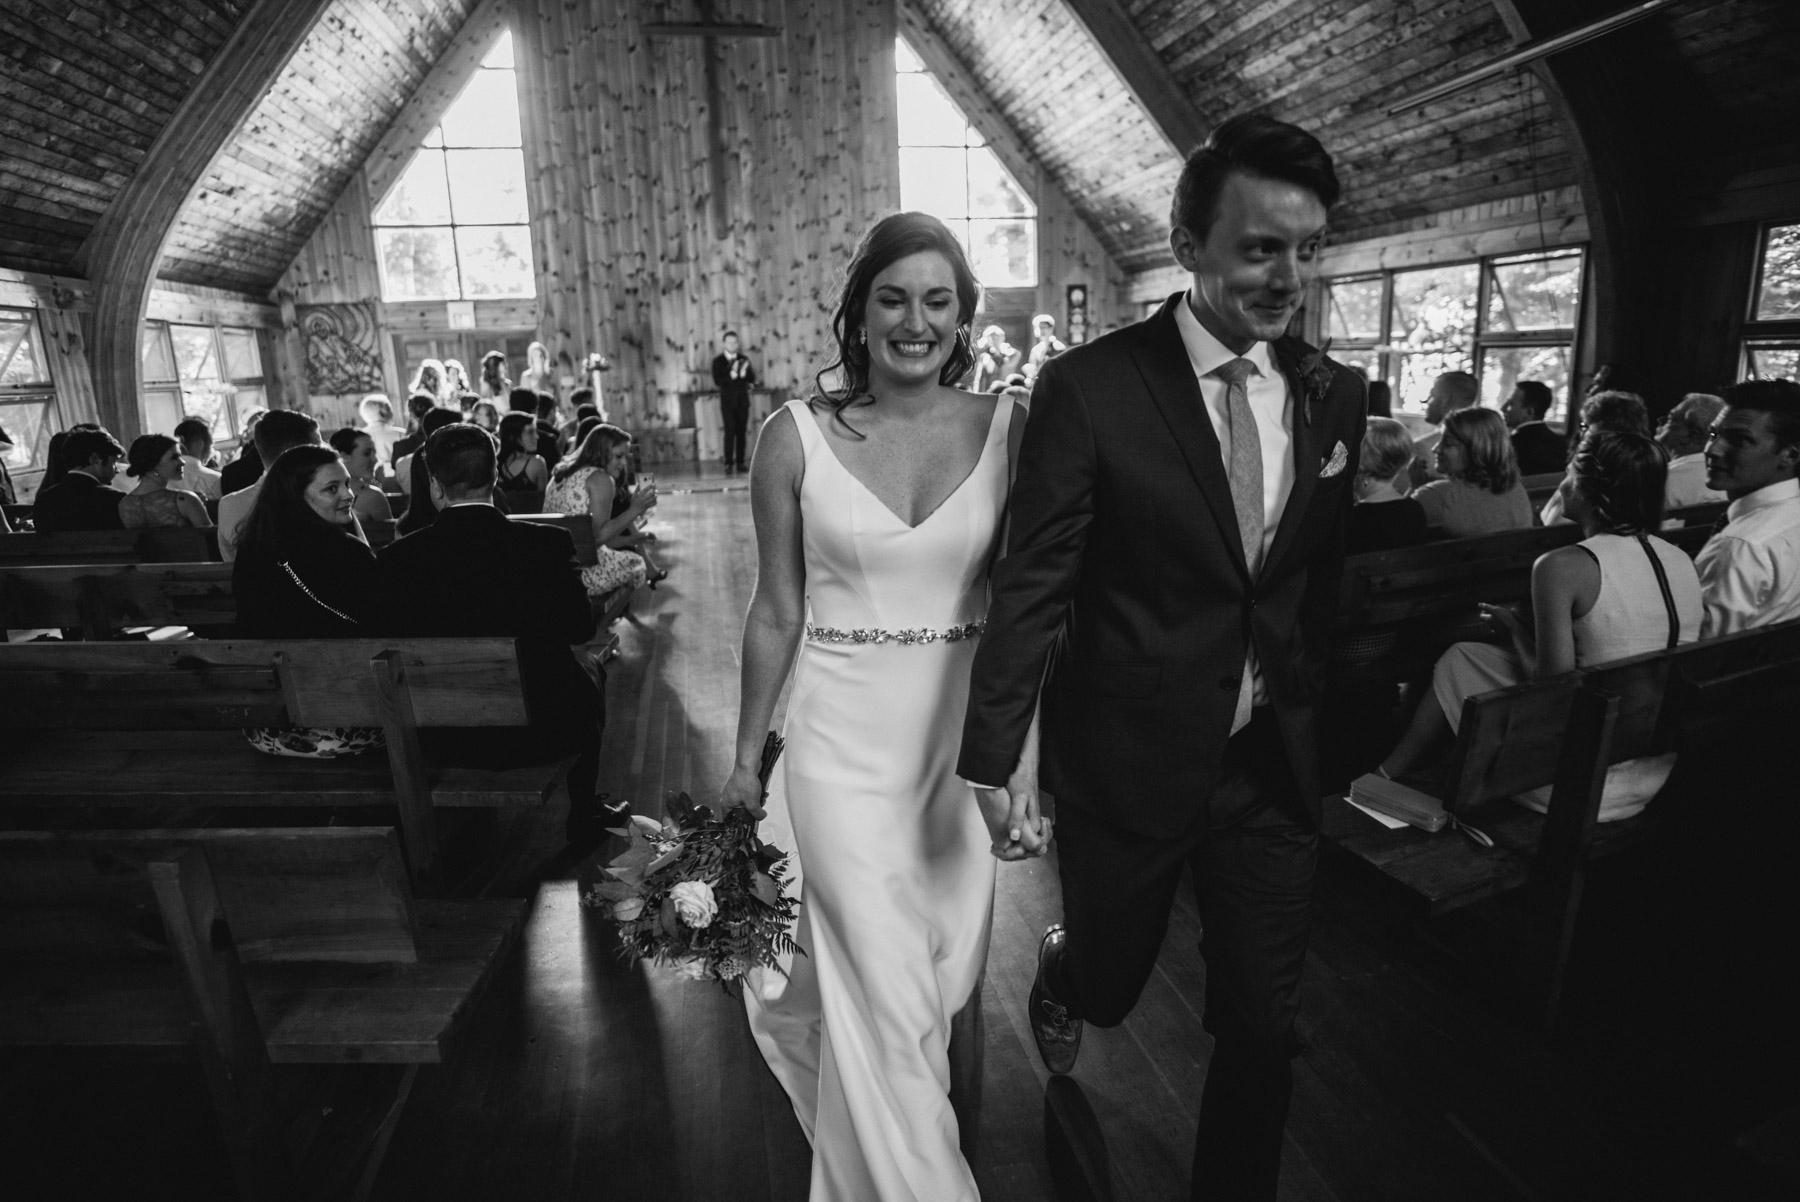 Wedding-Photography-Campground-11.jpg